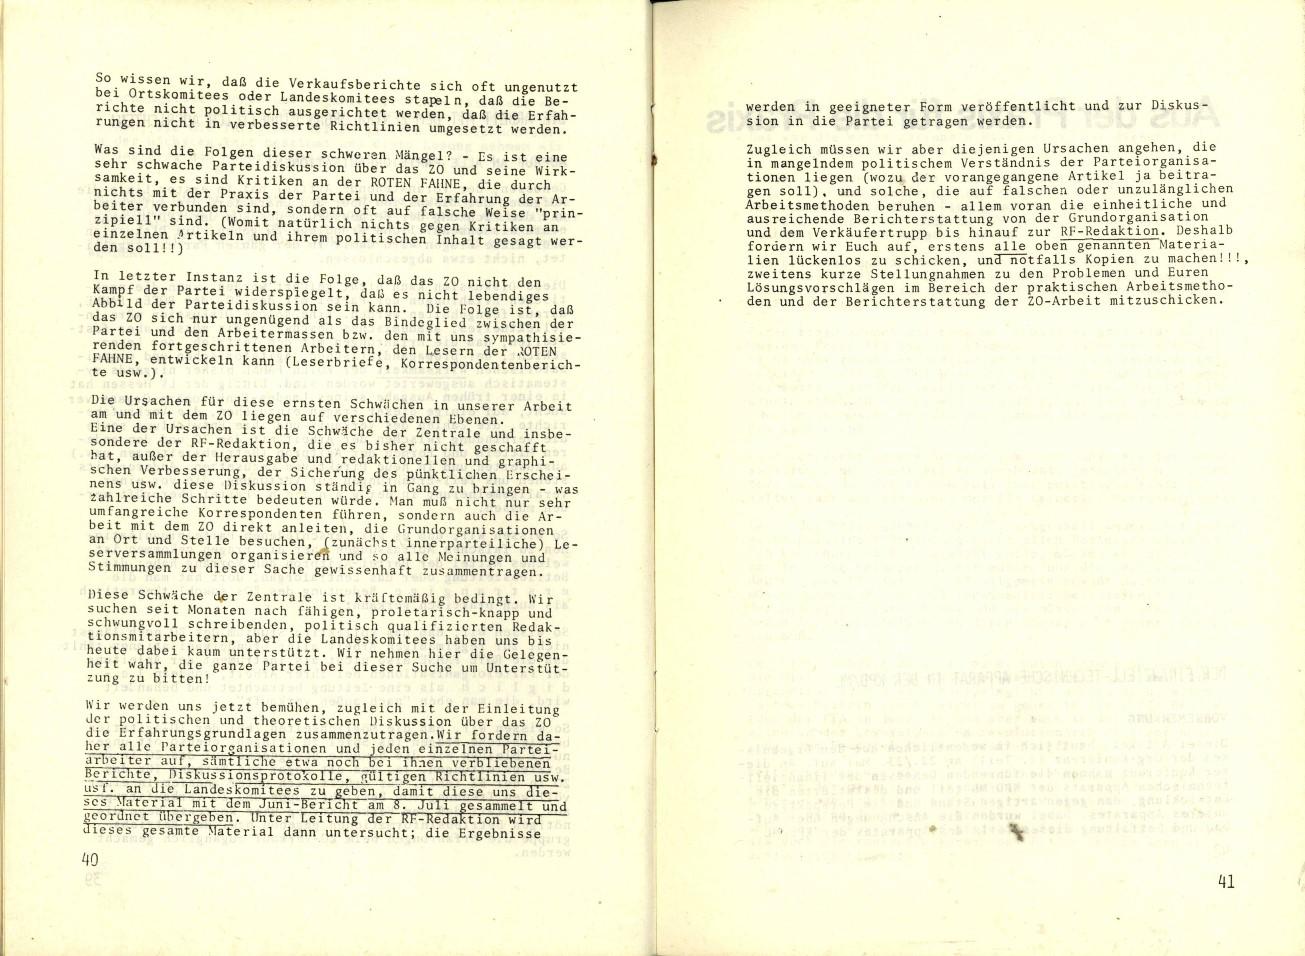 ZB_Parteiarbeiter_1971_06_22